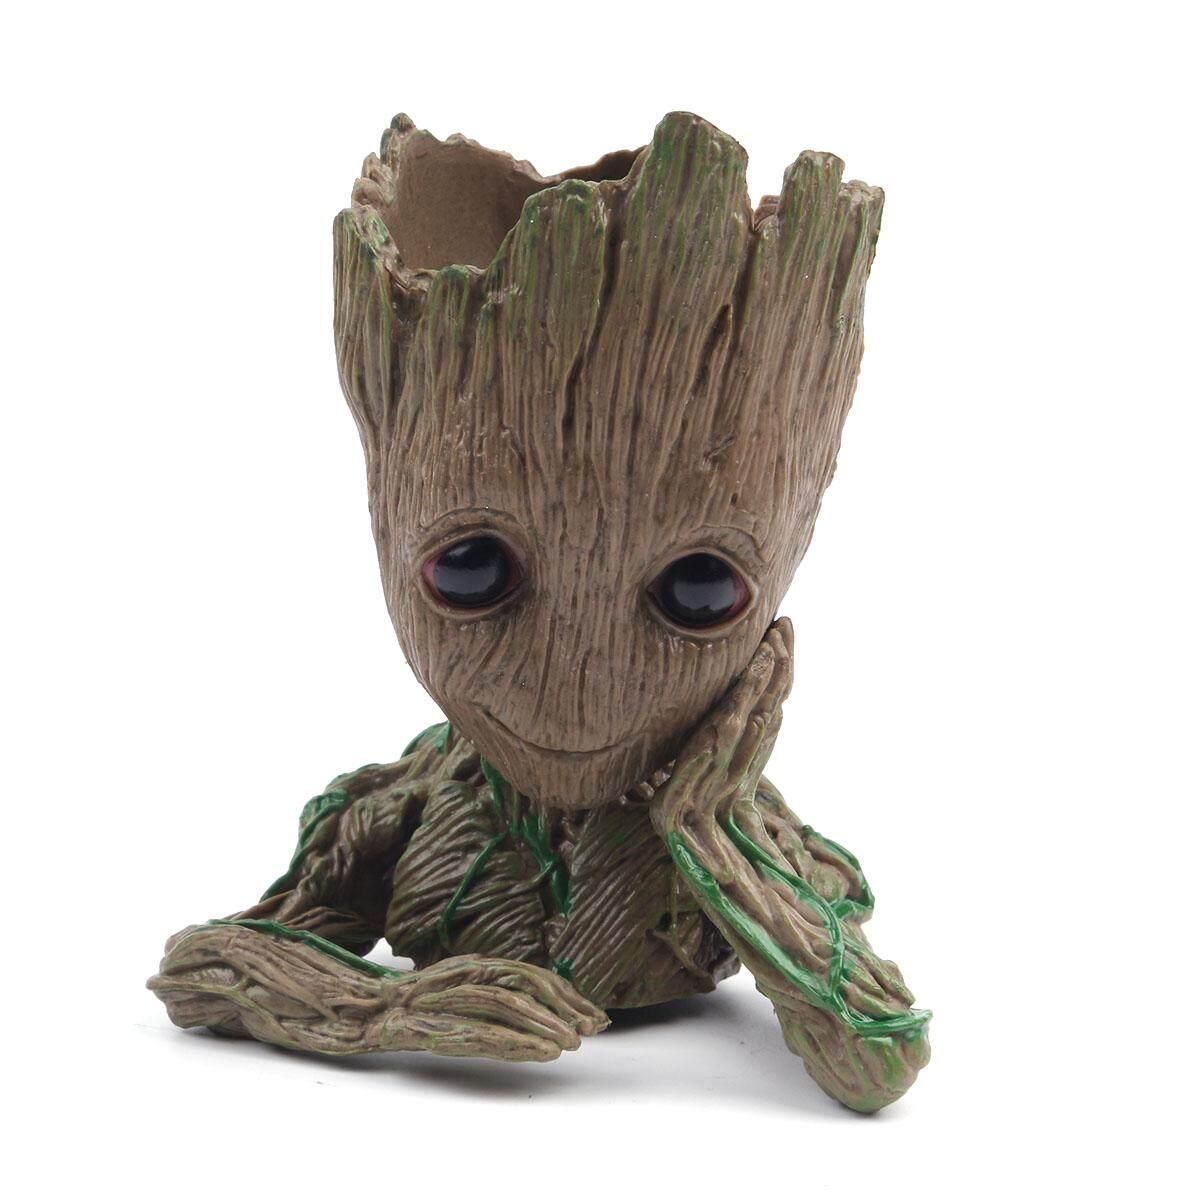 Fashion Guardians Of The Galaxy Pot Bunga Bayi Groot Boneka Tokoh Model Imut Pena Mainan Pot